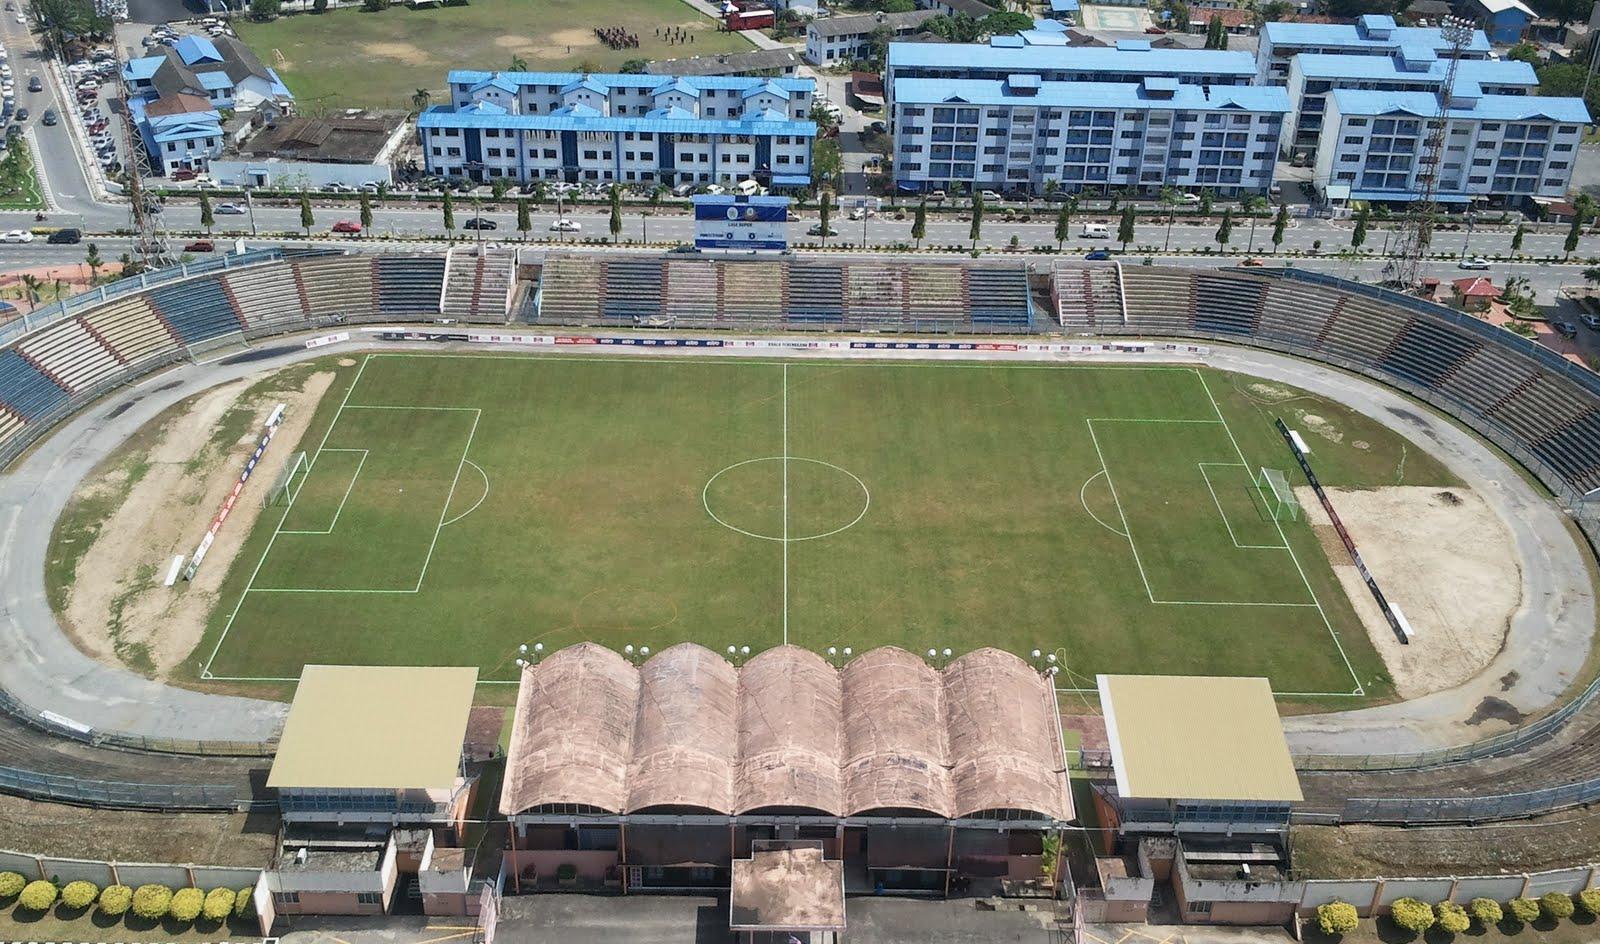 Brazilian soccer stadium Zerão